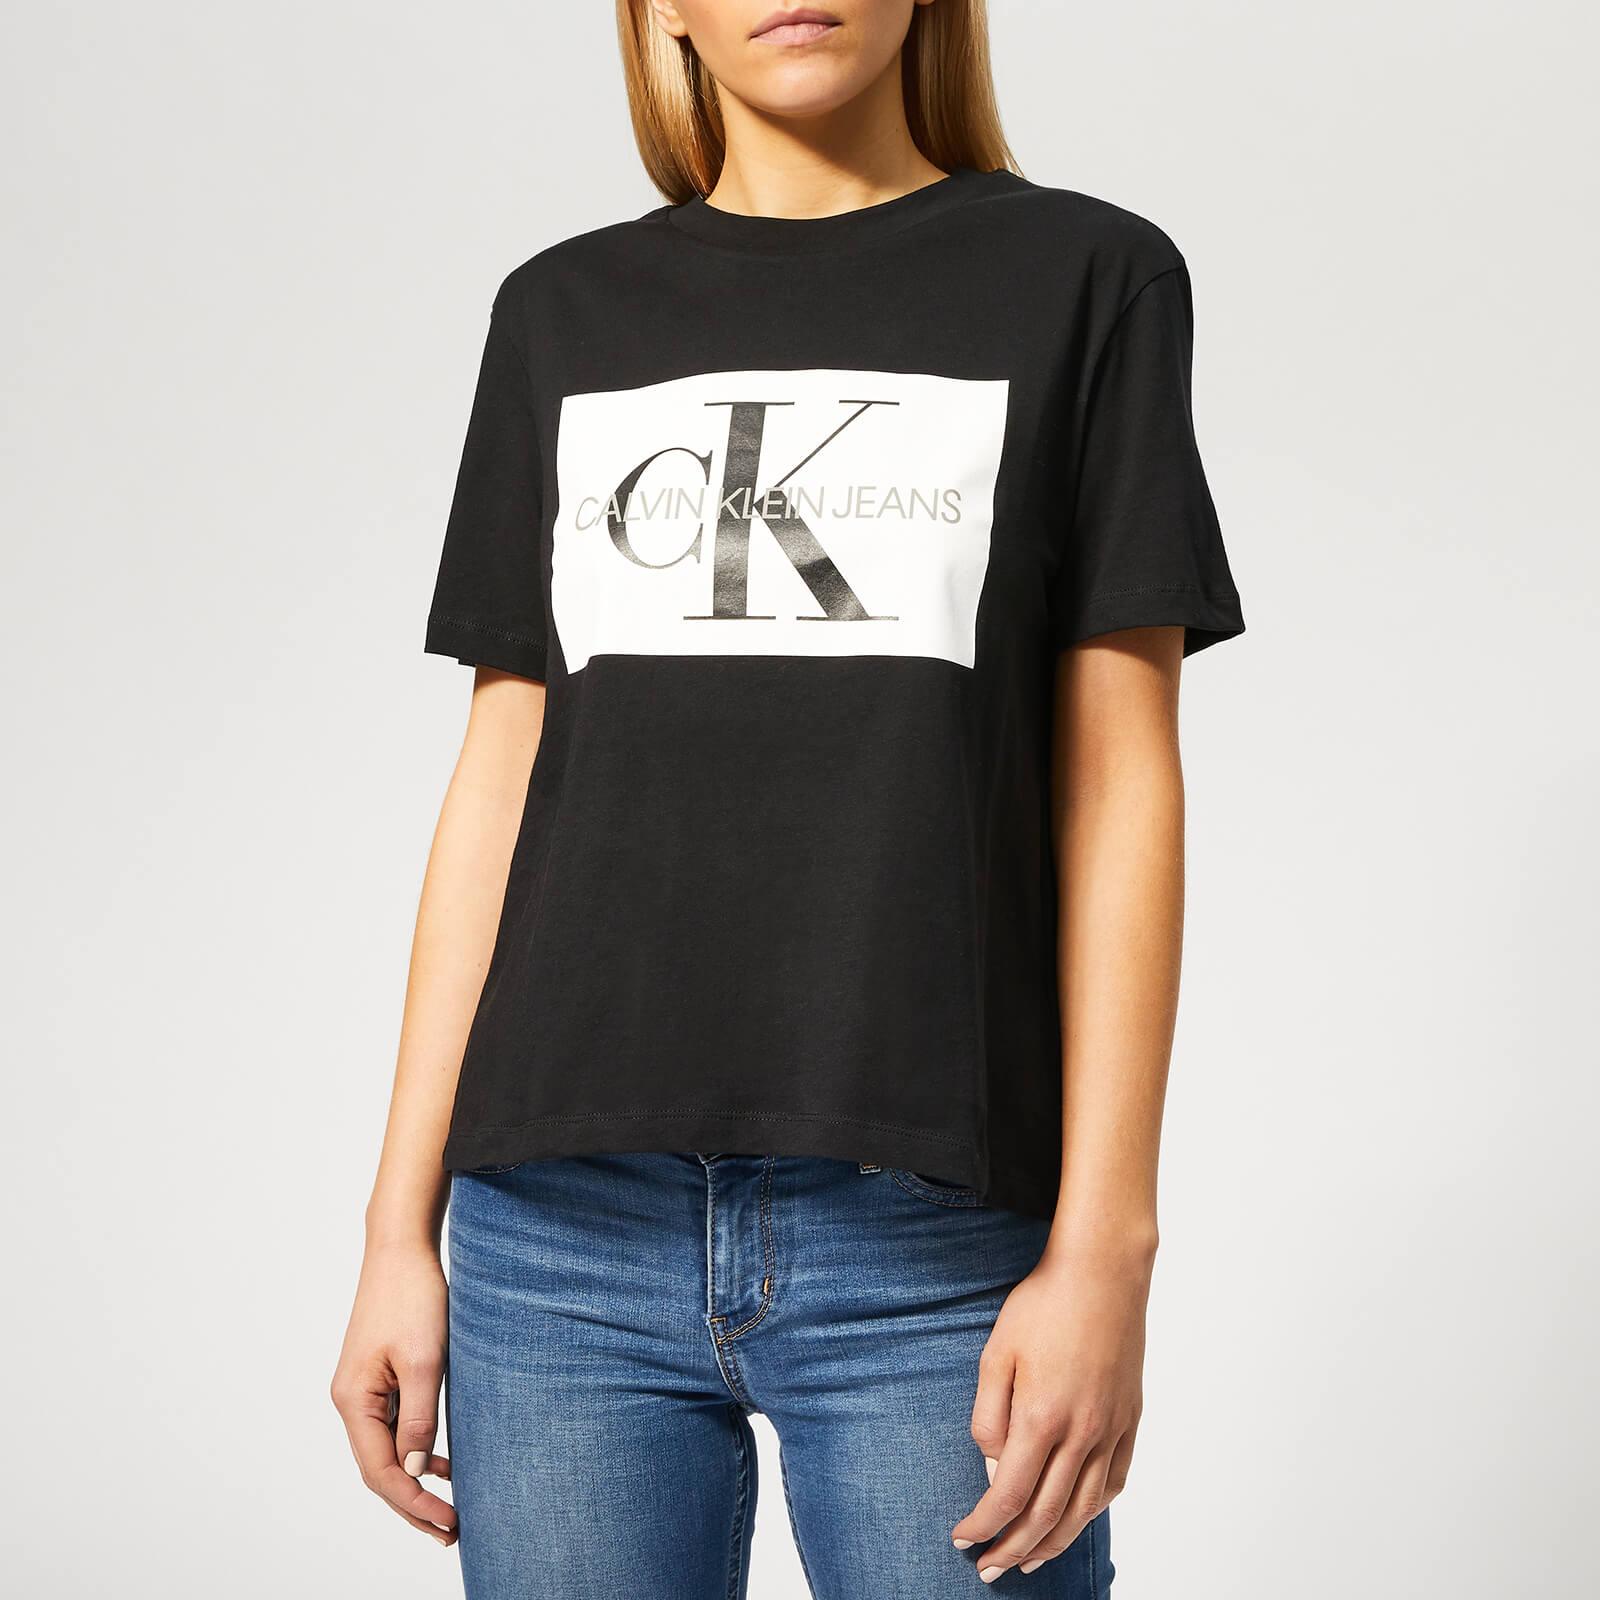 1101b5775b0c Calvin Klein Jeans Women's Iconic Monogram Box Straight T-Shirt - CK Black/White  Womens Clothing   TheHut.com